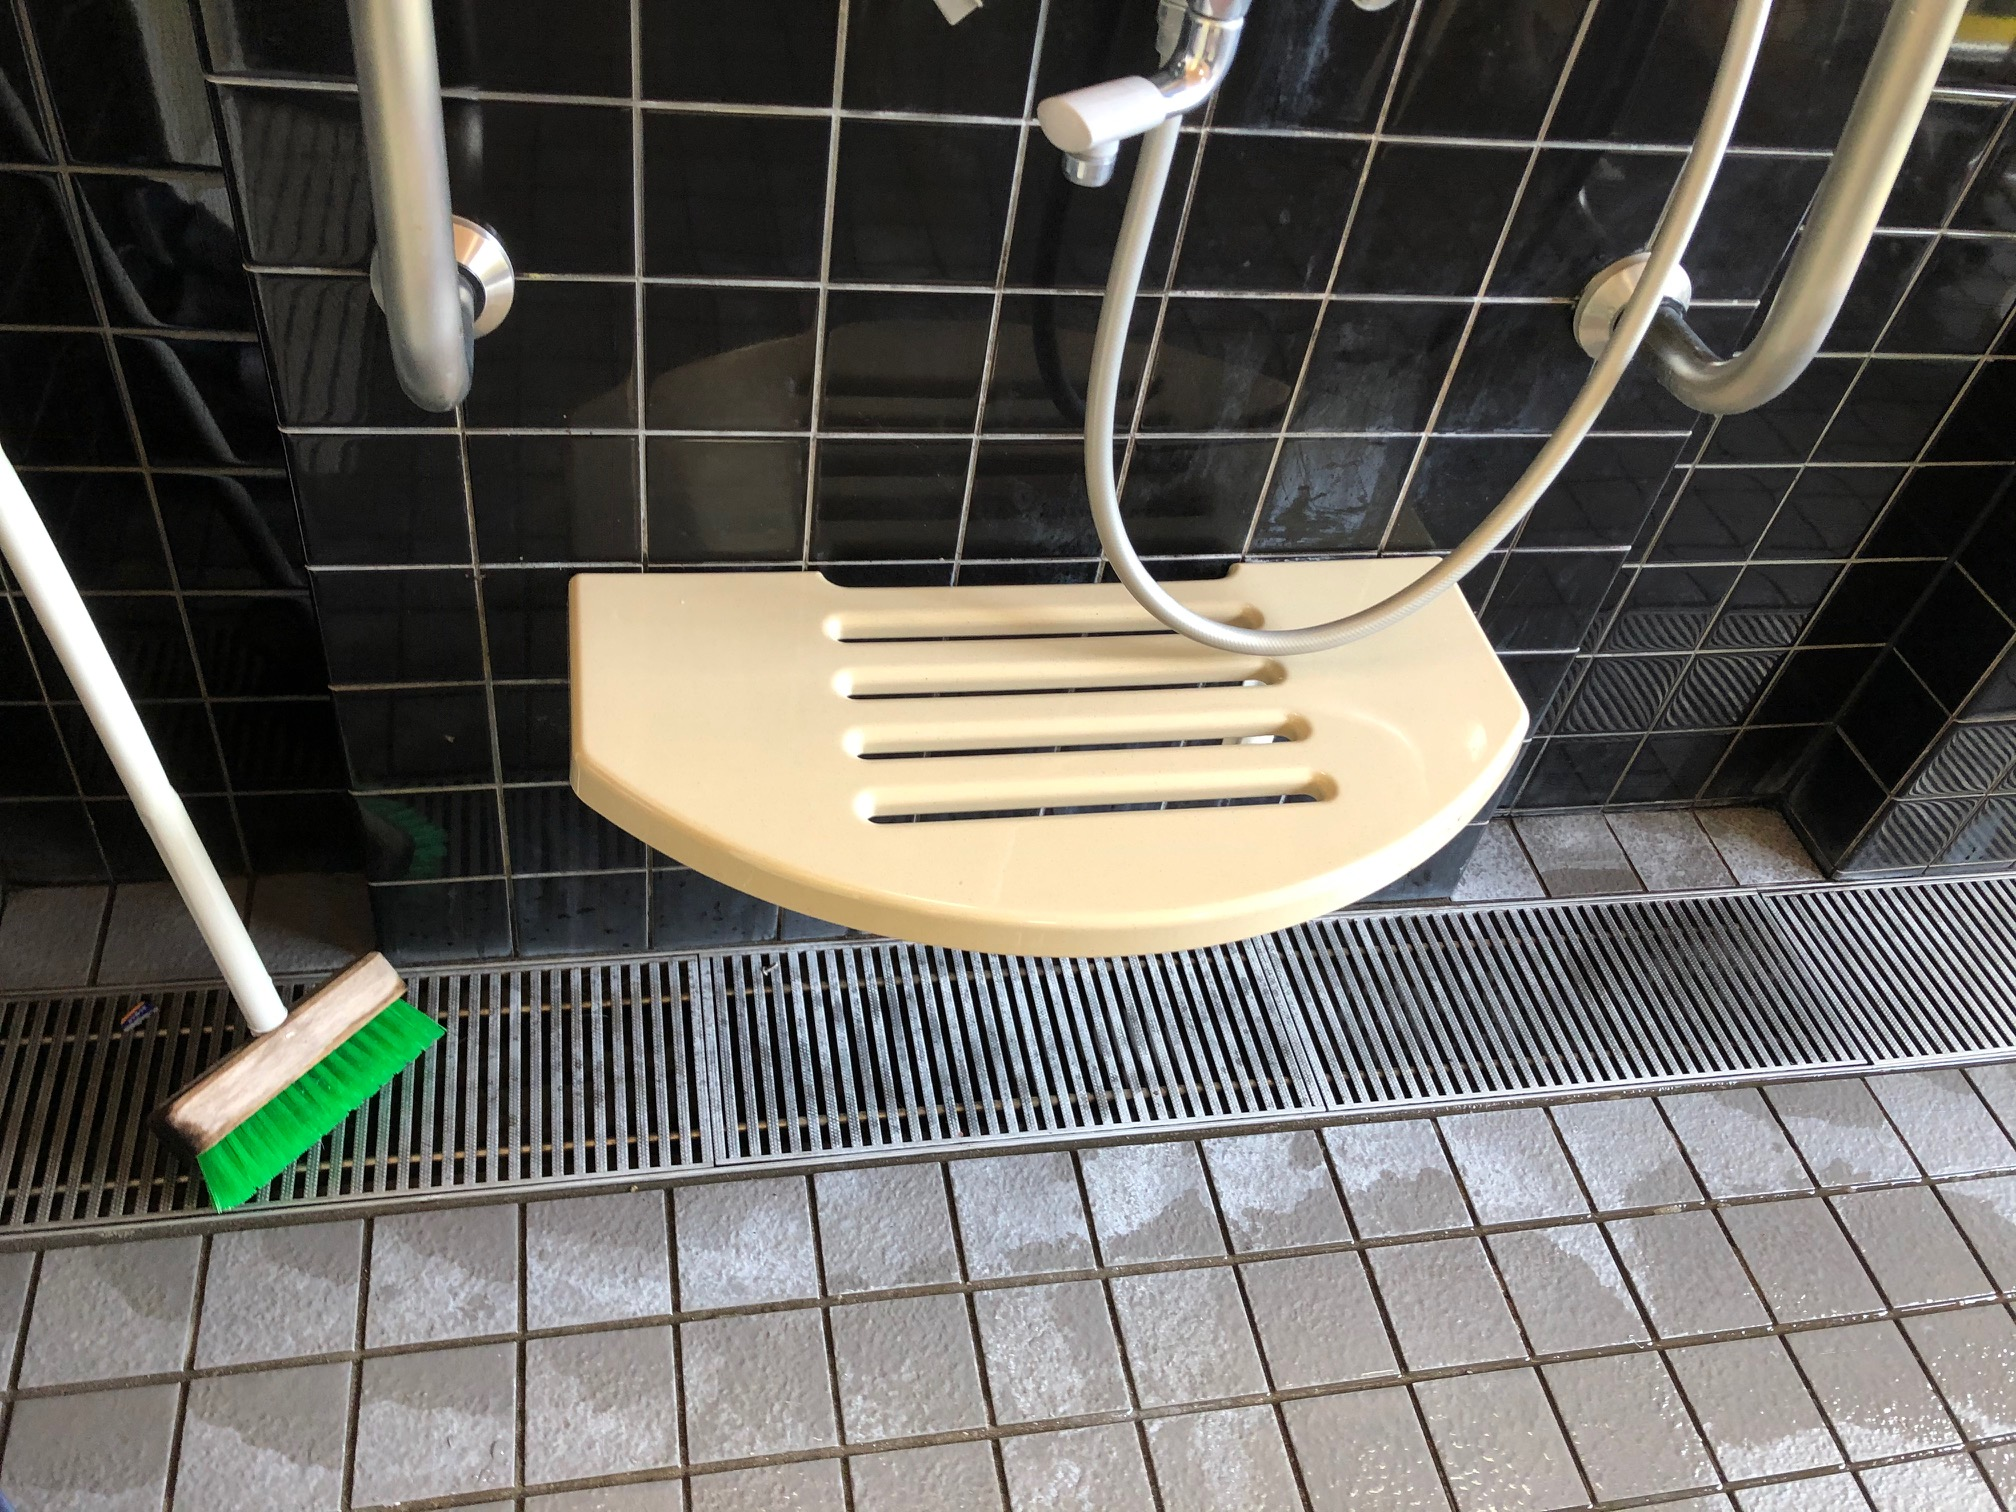 姫路市 福祉施設様の洗面置き台取替